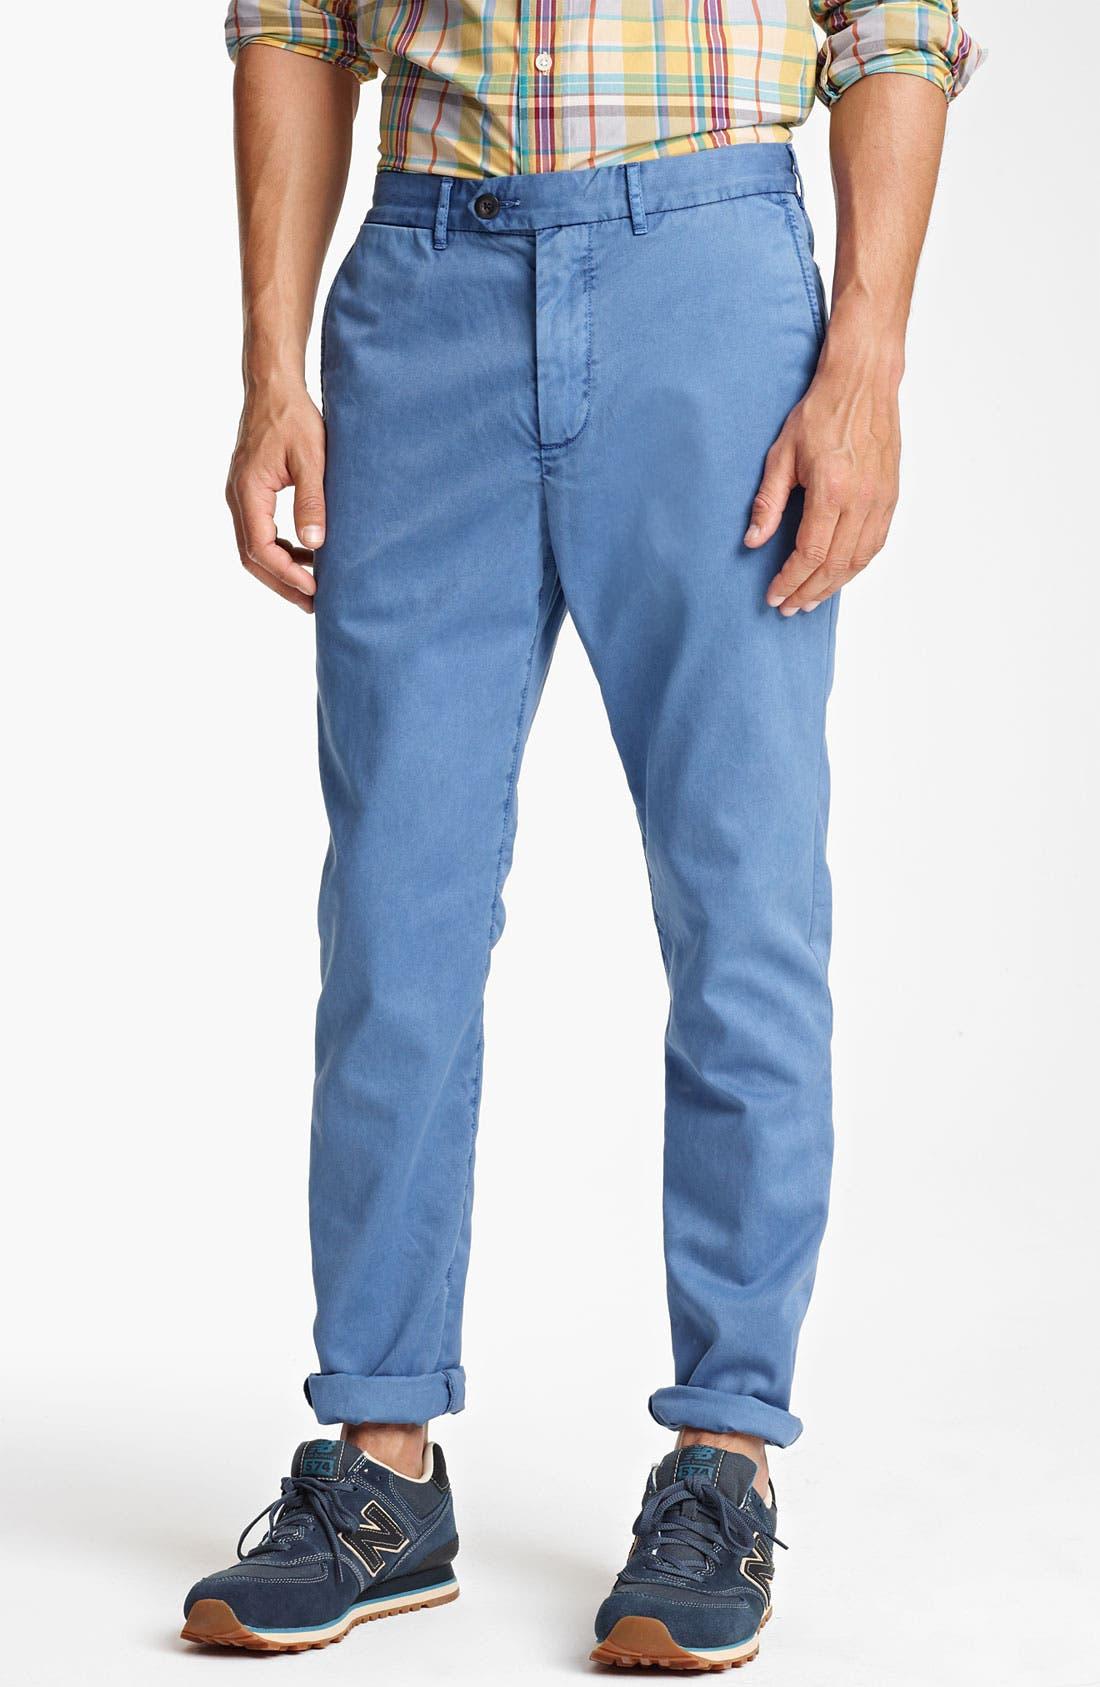 Alternate Image 1 Selected - Jack Spade 'Dolan' Pants